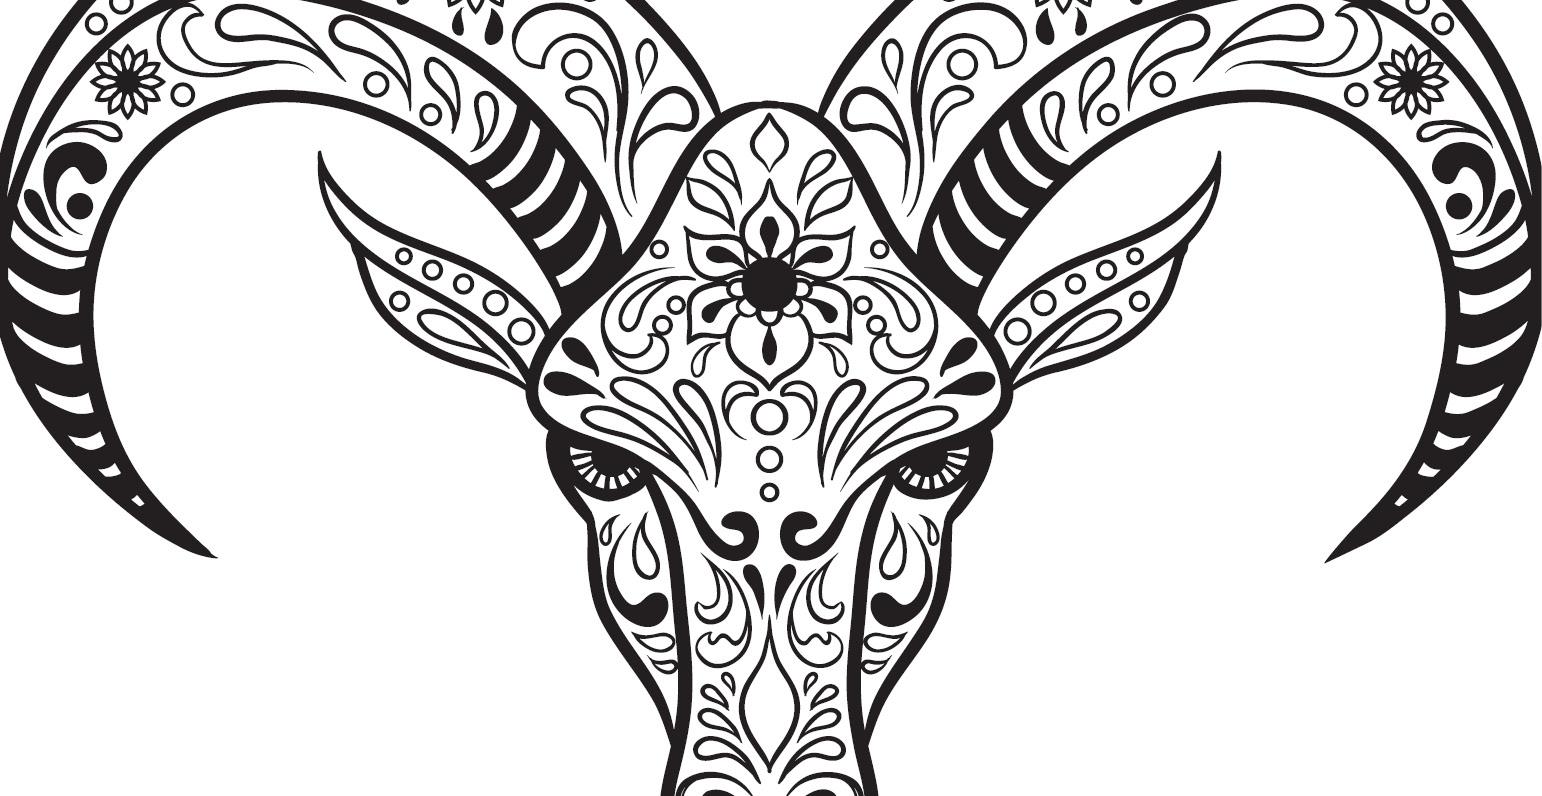 coloriage gratuit crane de chevre 15 mai